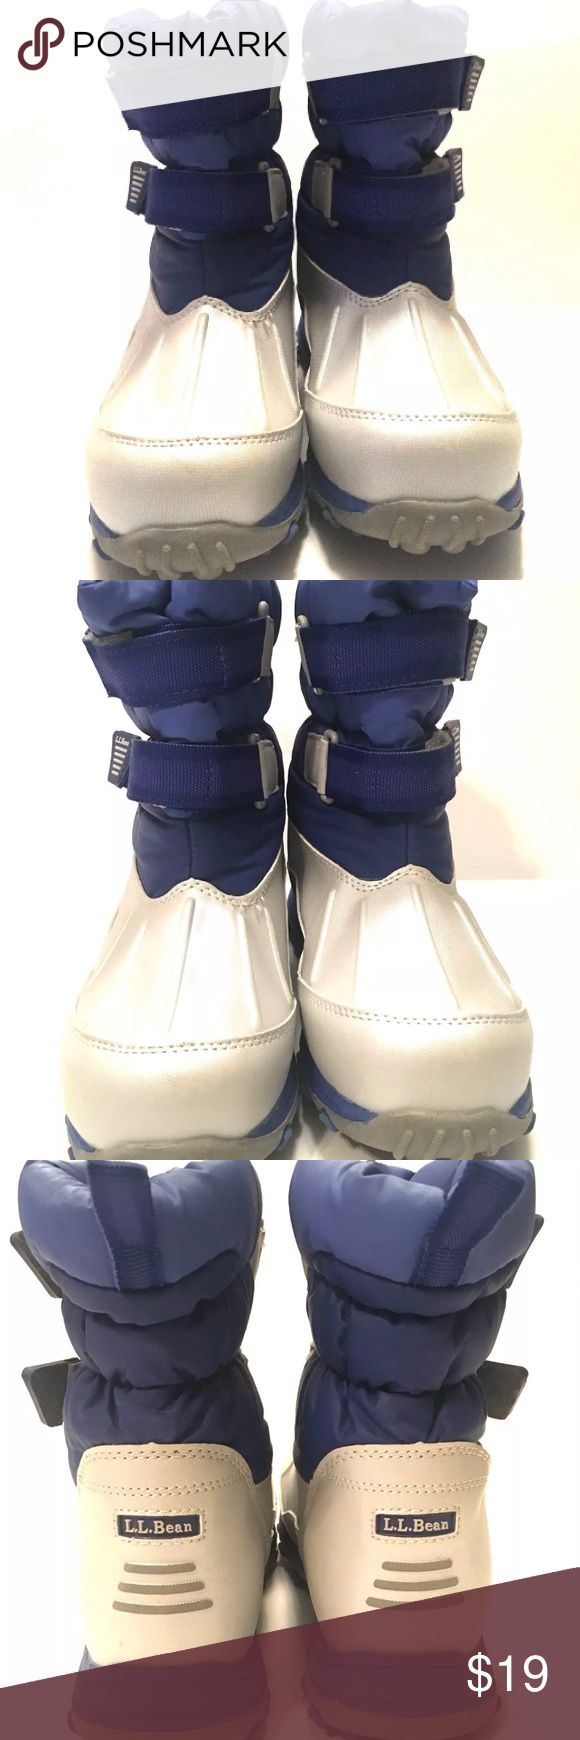 LL Bean Kids Snow Boots LL Bean  Kids Snow Boot  Like New Condition Double Strap Closure LL Bean Shoes Rain & Snow Boots